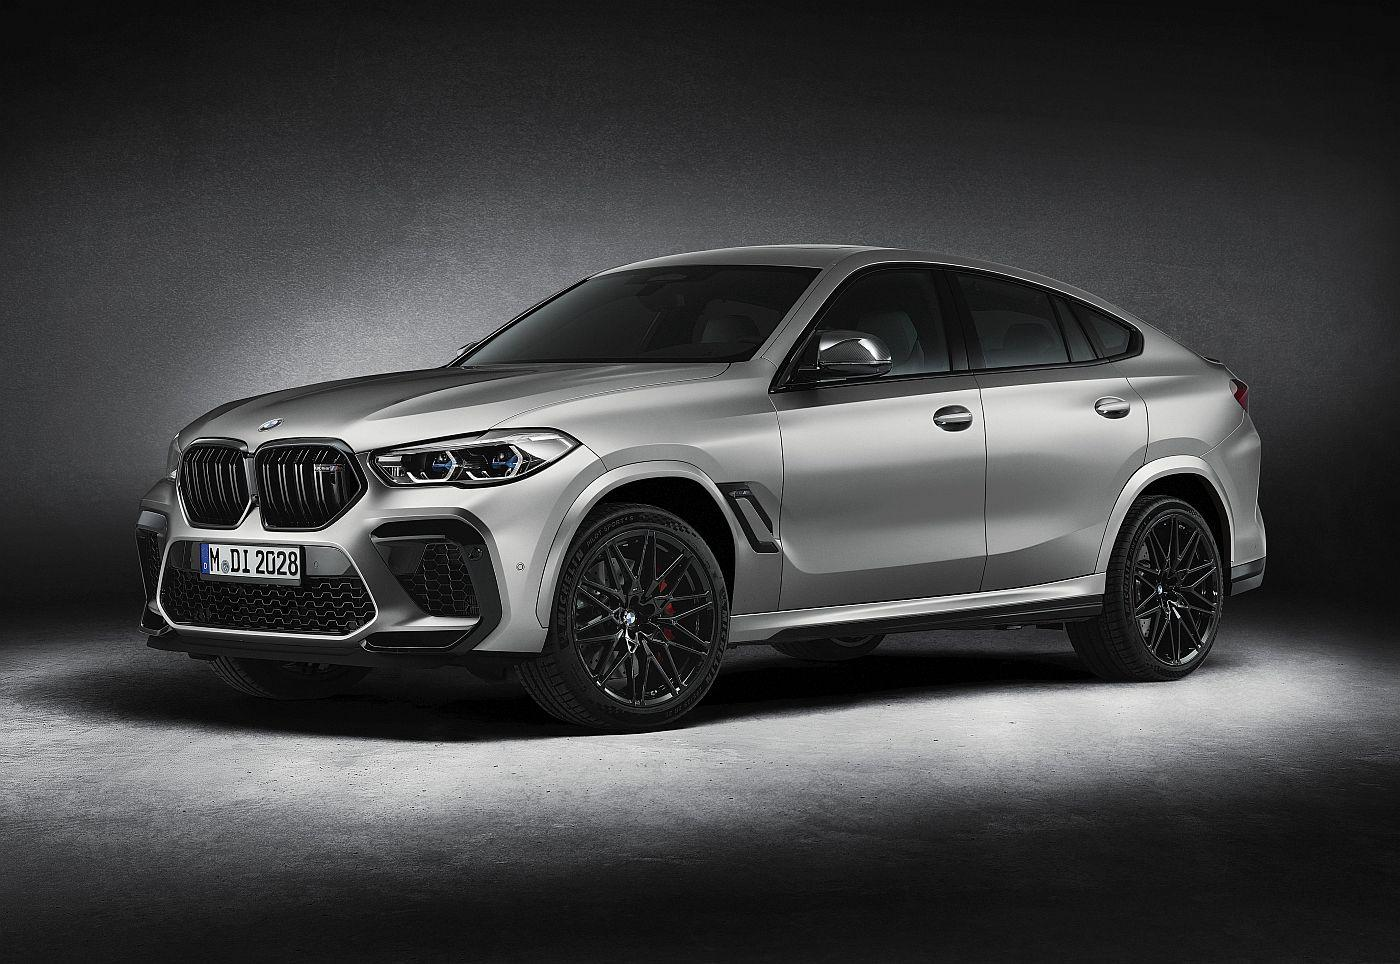 BMW X M First Edition